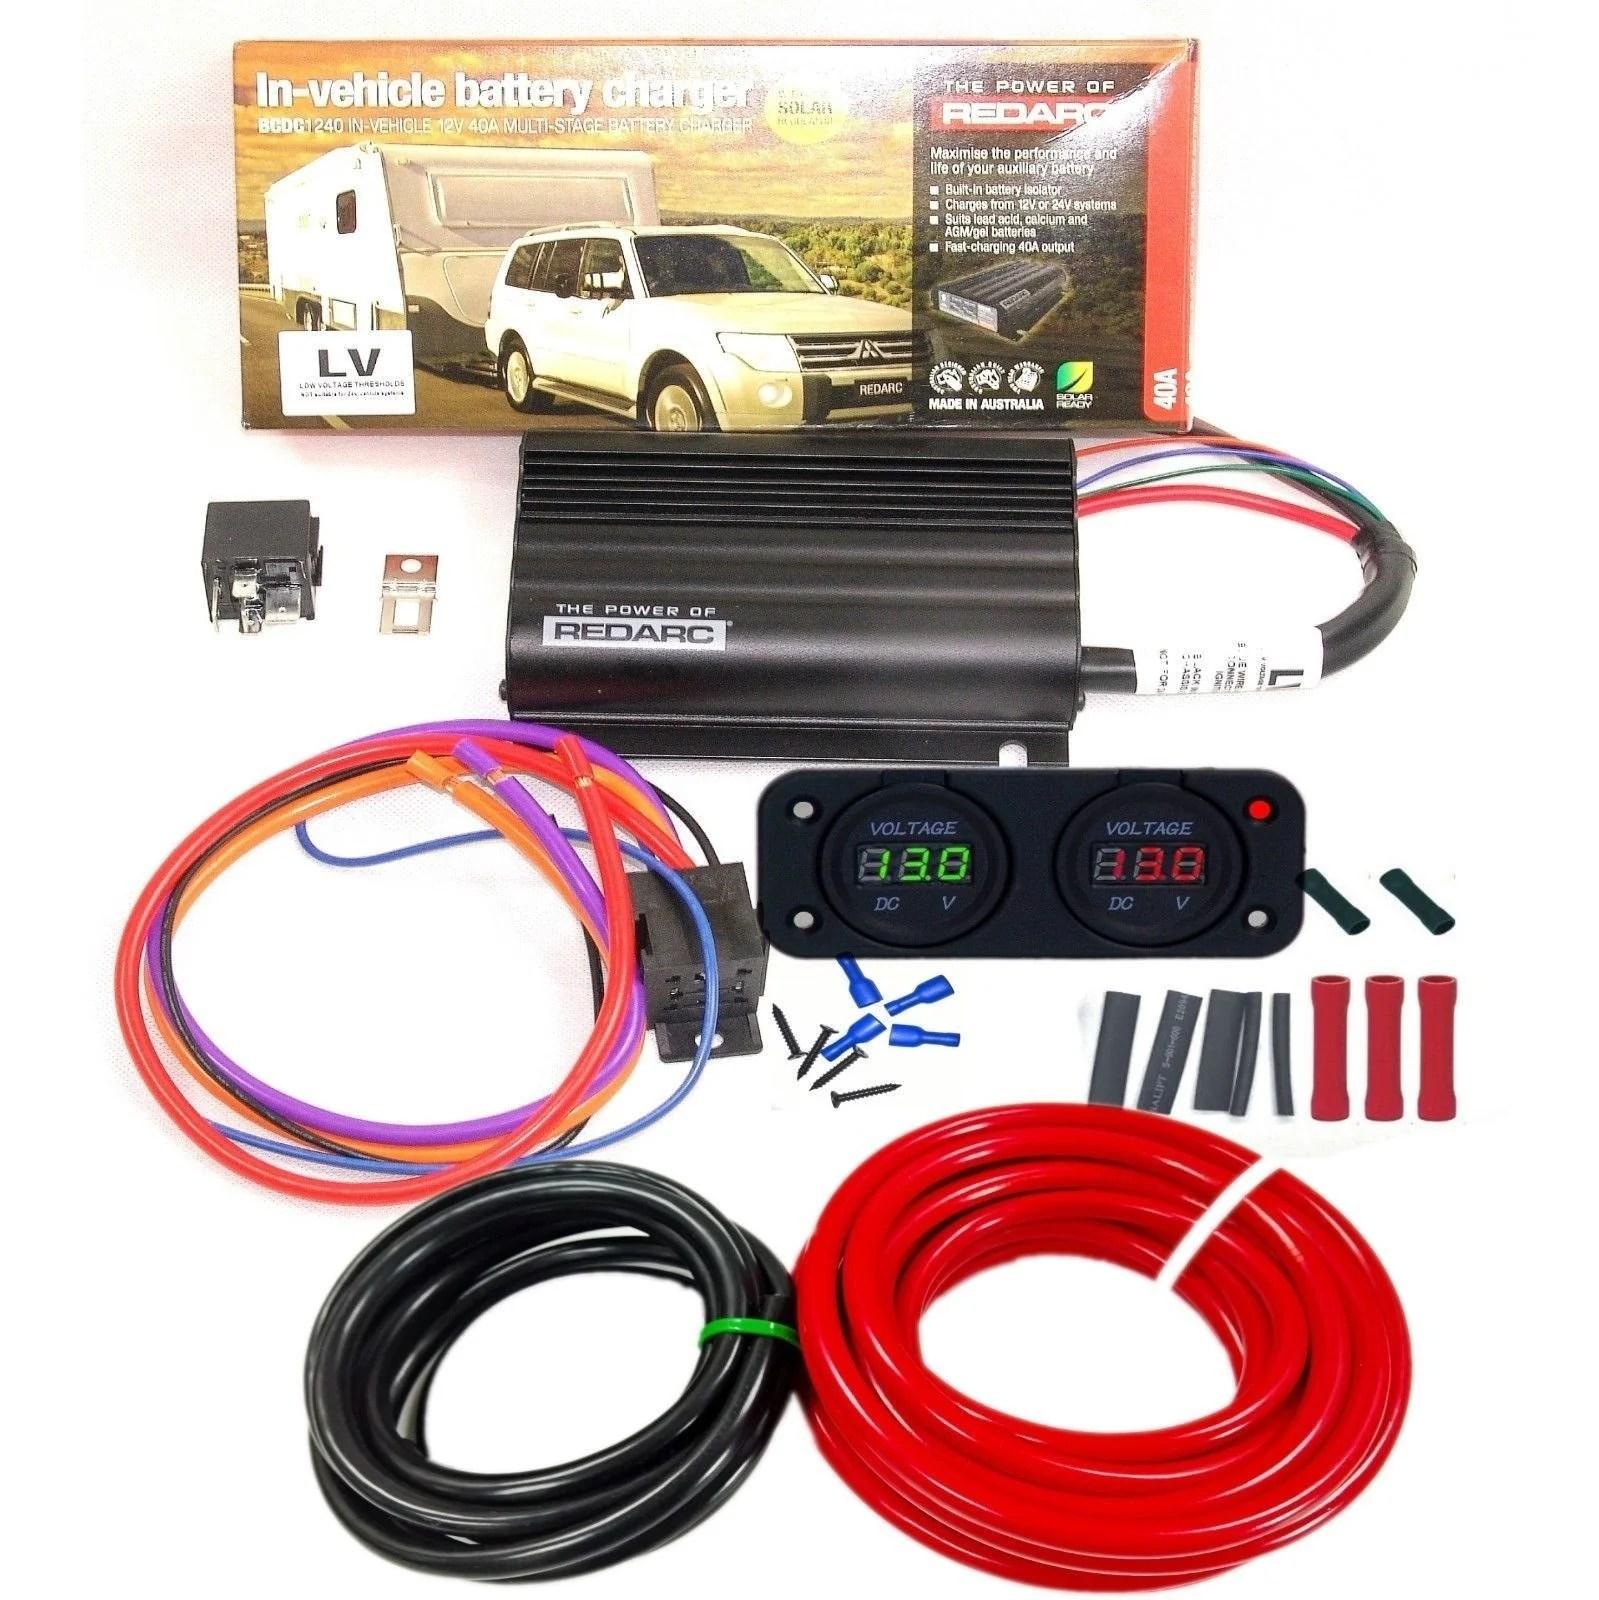 redarc bcdc 1240 24v to 12v dual battery system dc dc charger mppt solar kit [ 1599 x 1600 Pixel ]